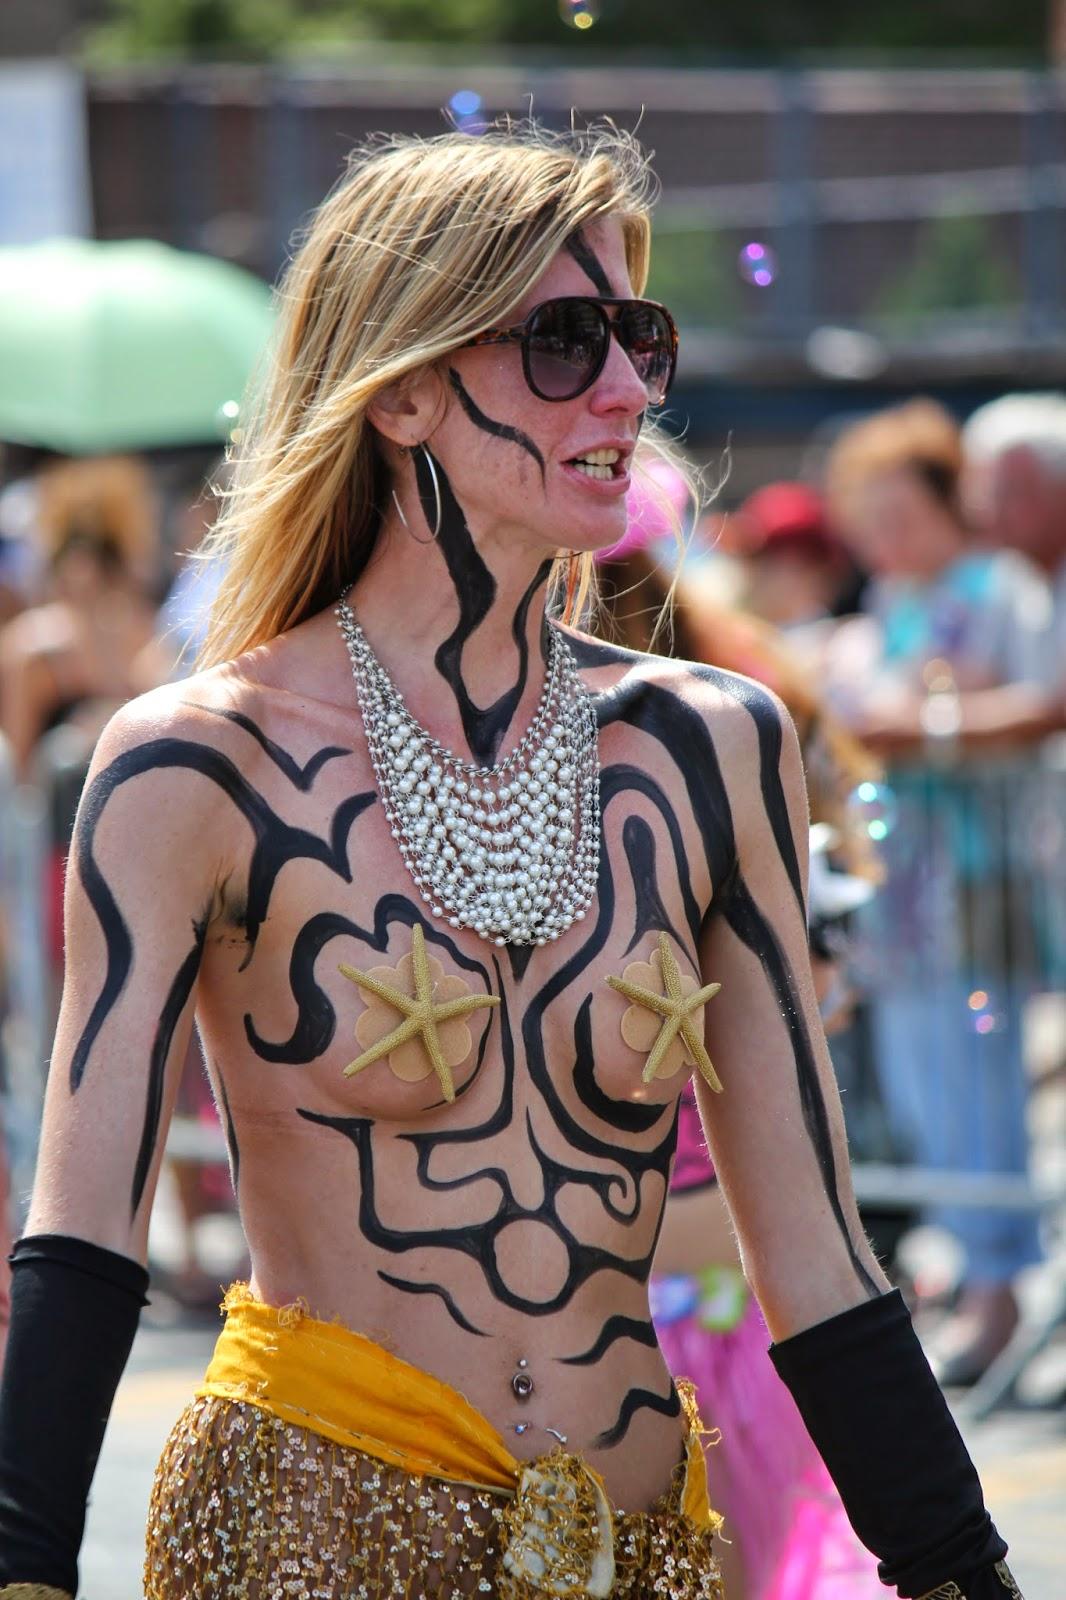 Imagenes de pintura corporal - Body painting